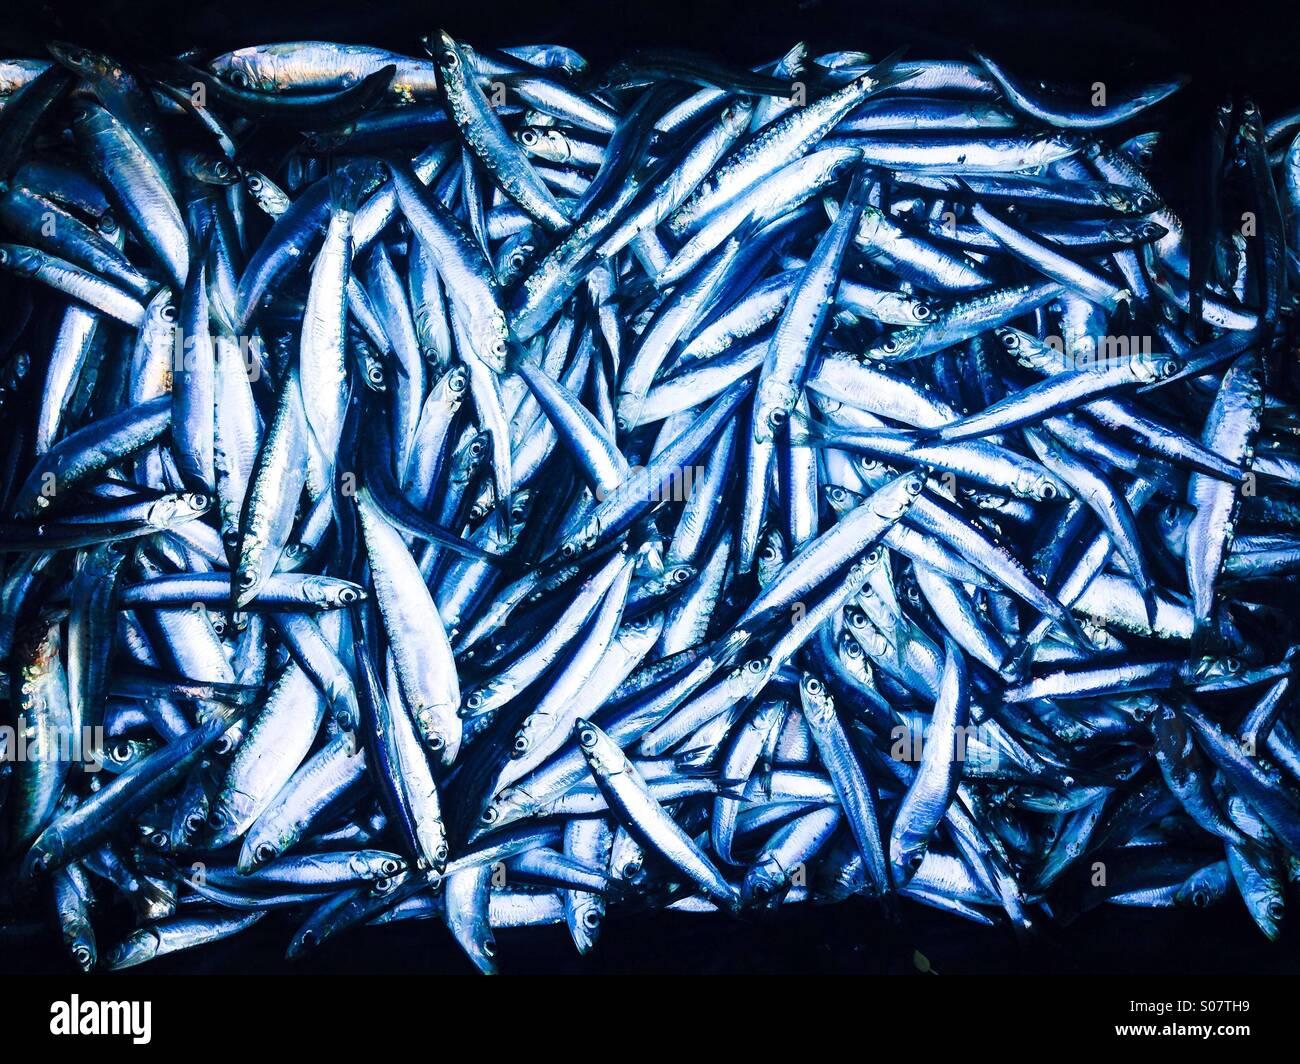 Many fresh anchovies and sardines fish - Stock Image